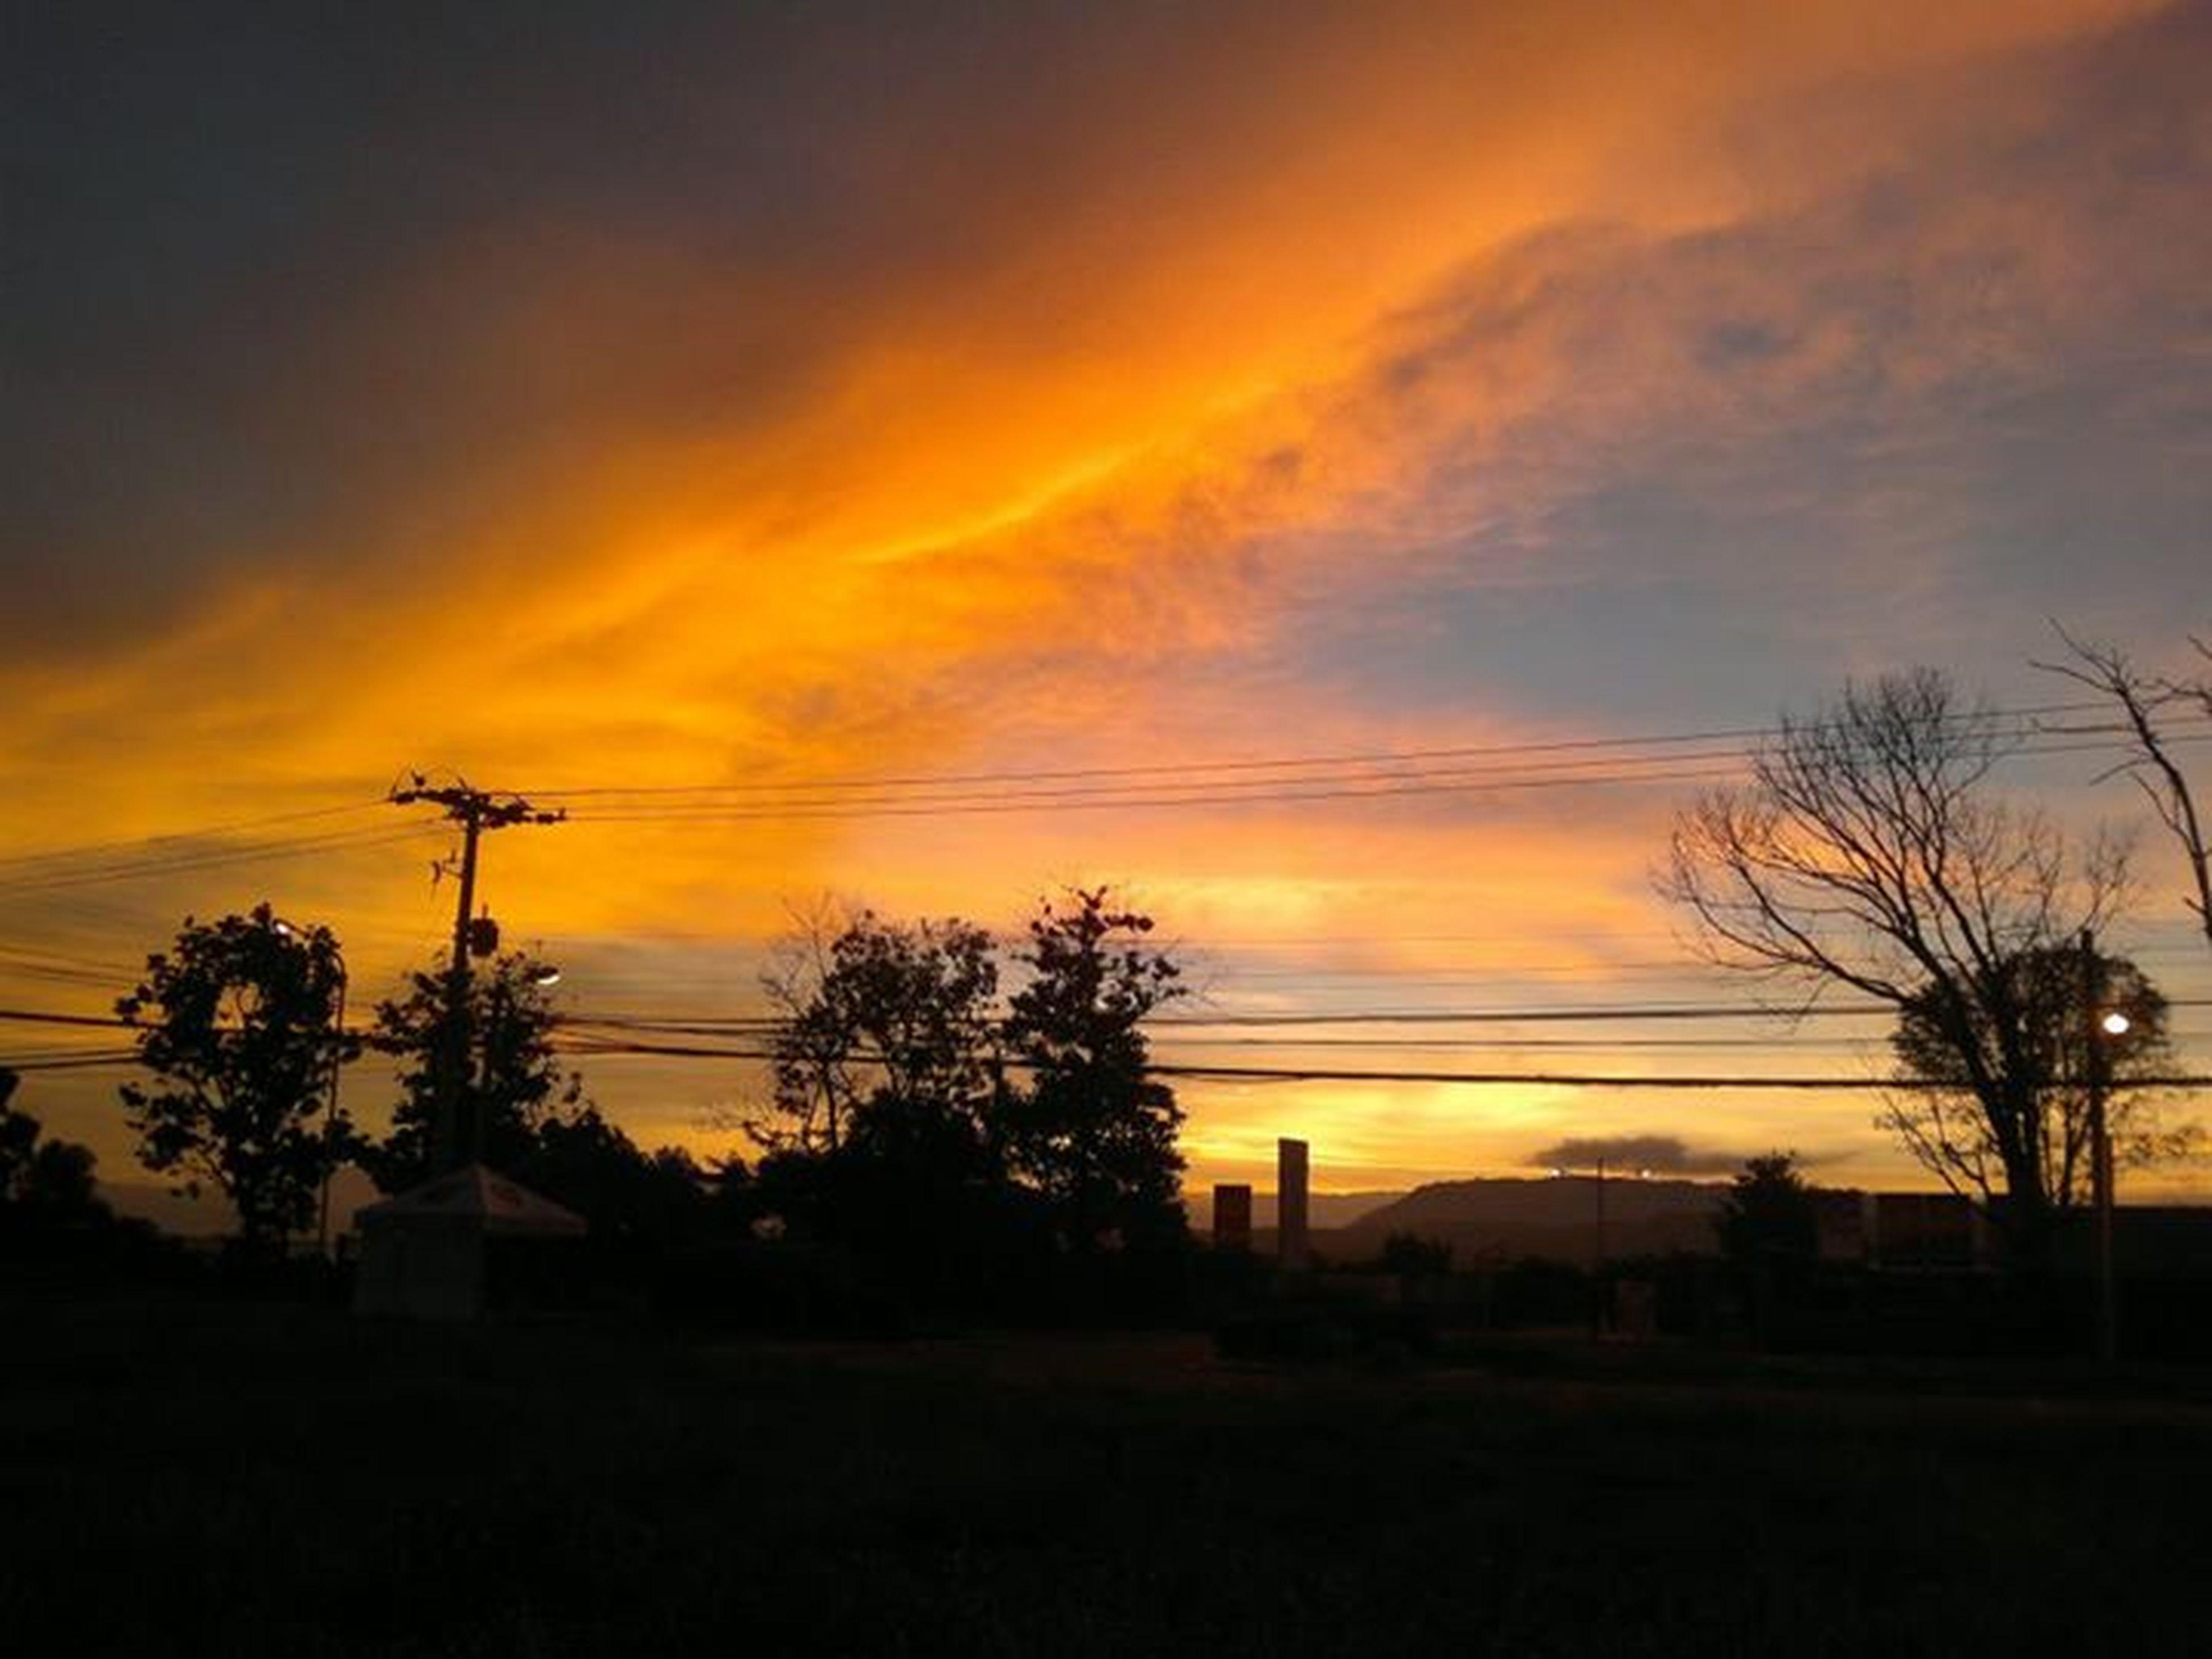 sunset, silhouette, orange color, sky, scenics, beauty in nature, tree, tranquility, tranquil scene, nature, cloud - sky, idyllic, landscape, dramatic sky, power line, cloud, moody sky, dark, romantic sky, electricity pylon